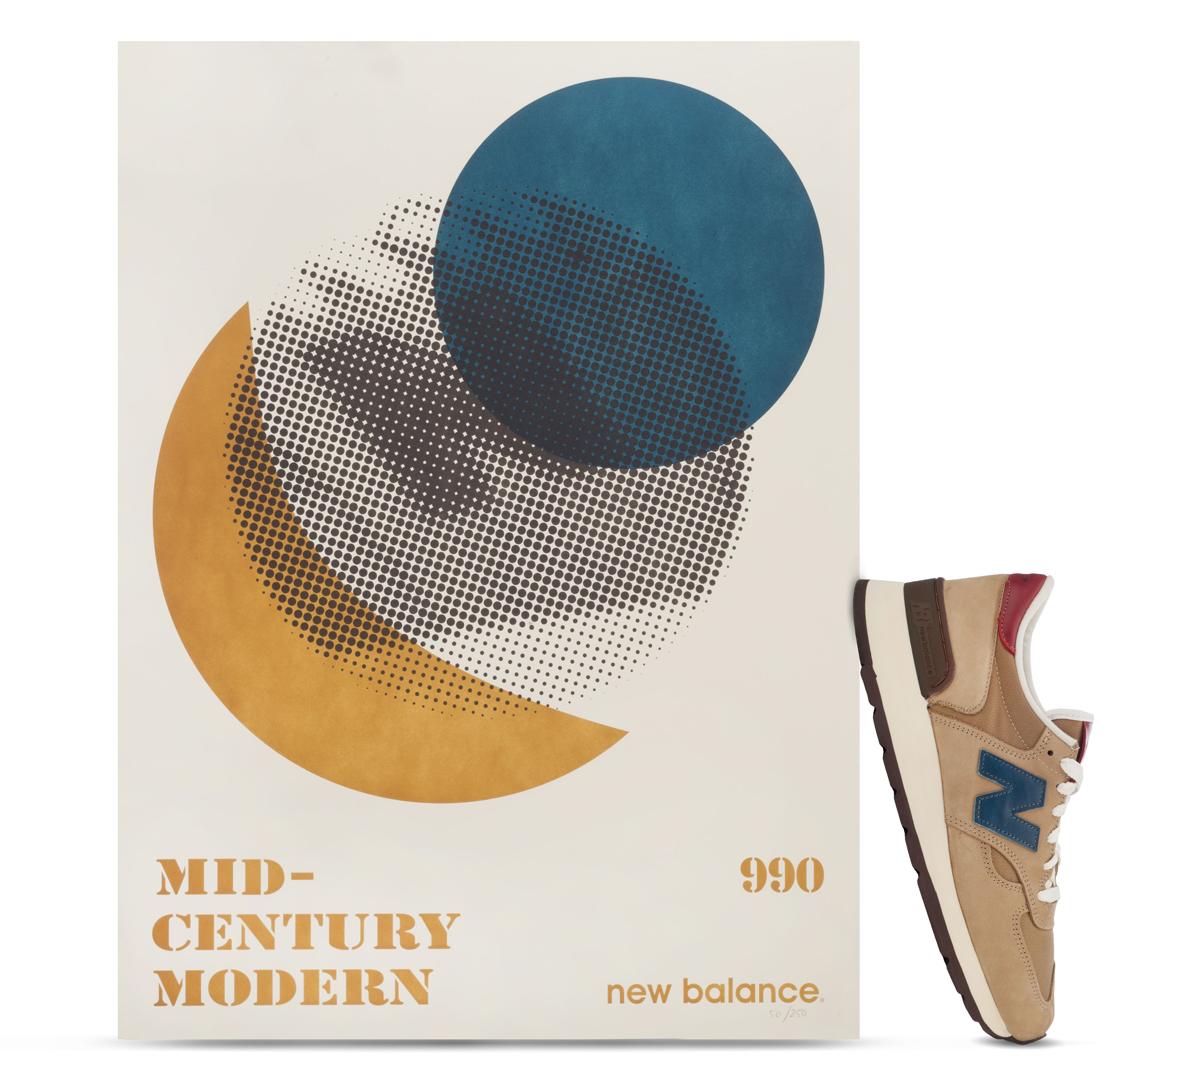 new-balance-mid-century-modern-collection-04